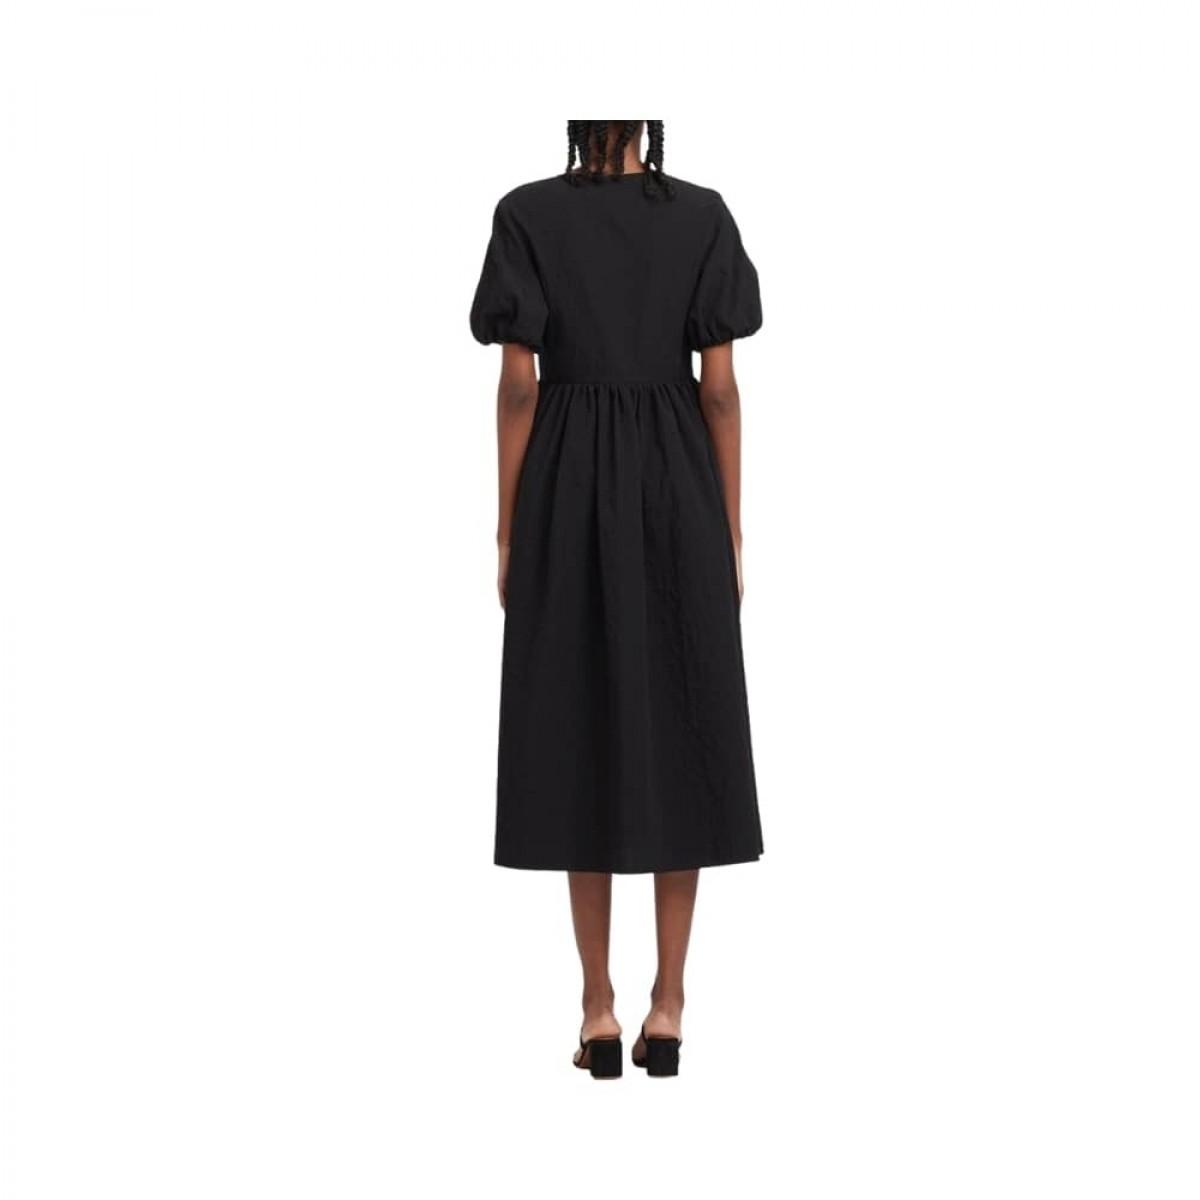 v neck dress with puff sleeves - black - model ryg